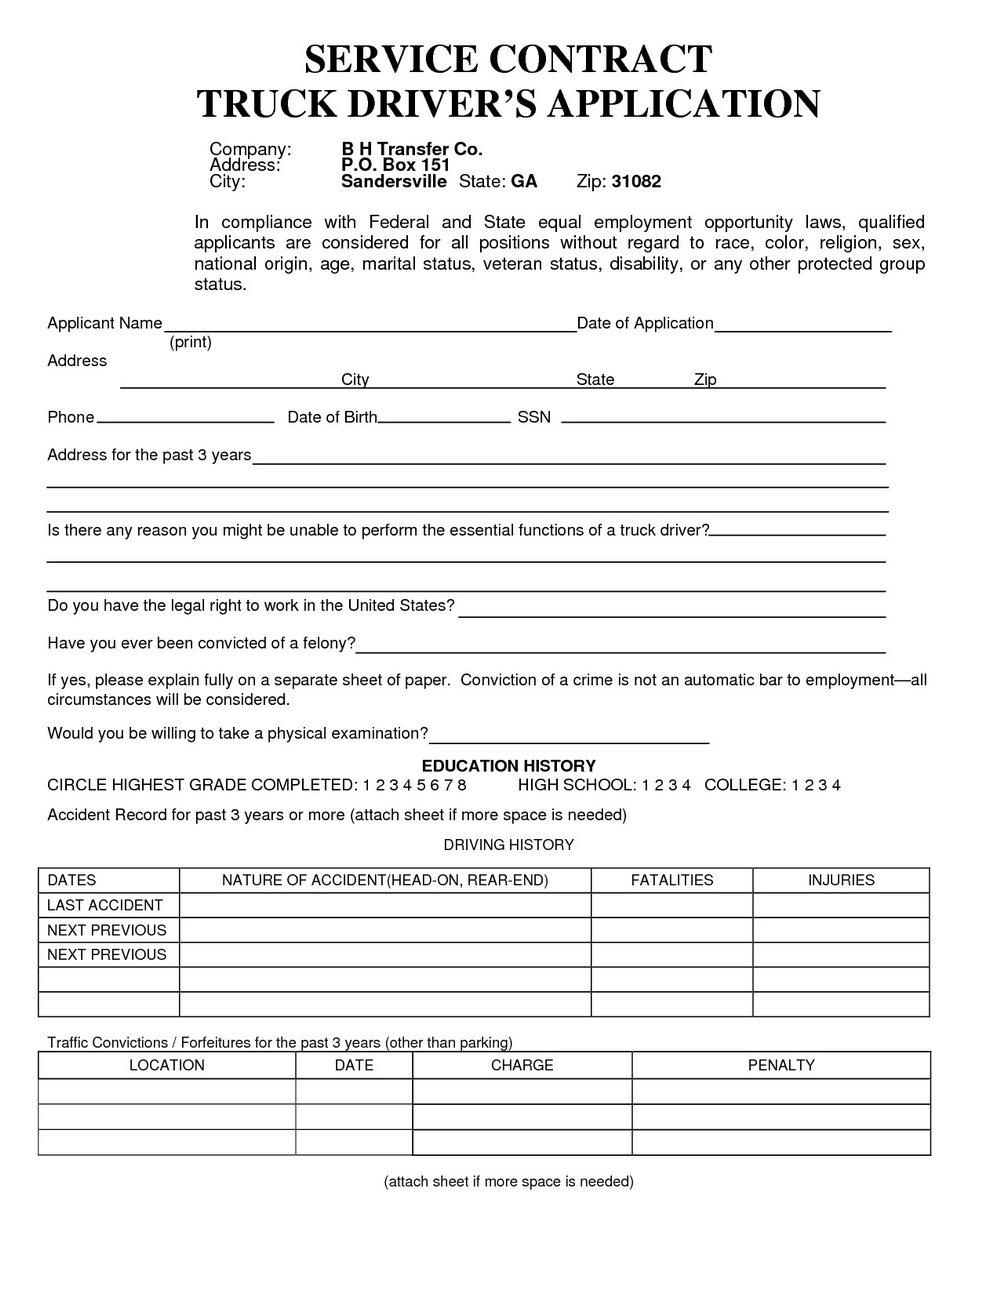 Mta Bus Driver Application